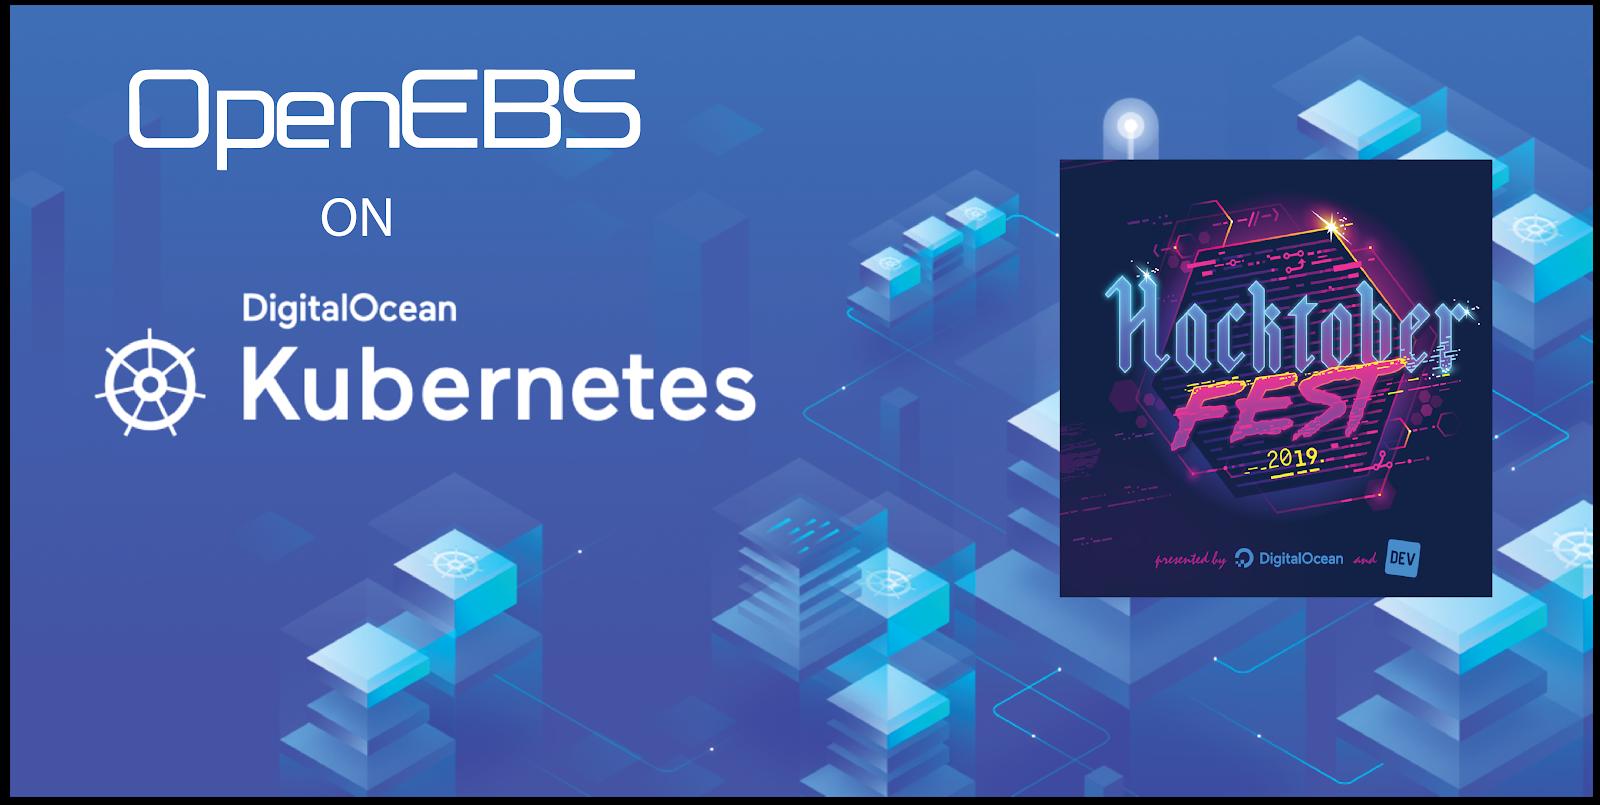 OpenEBS and Hacktoberfest